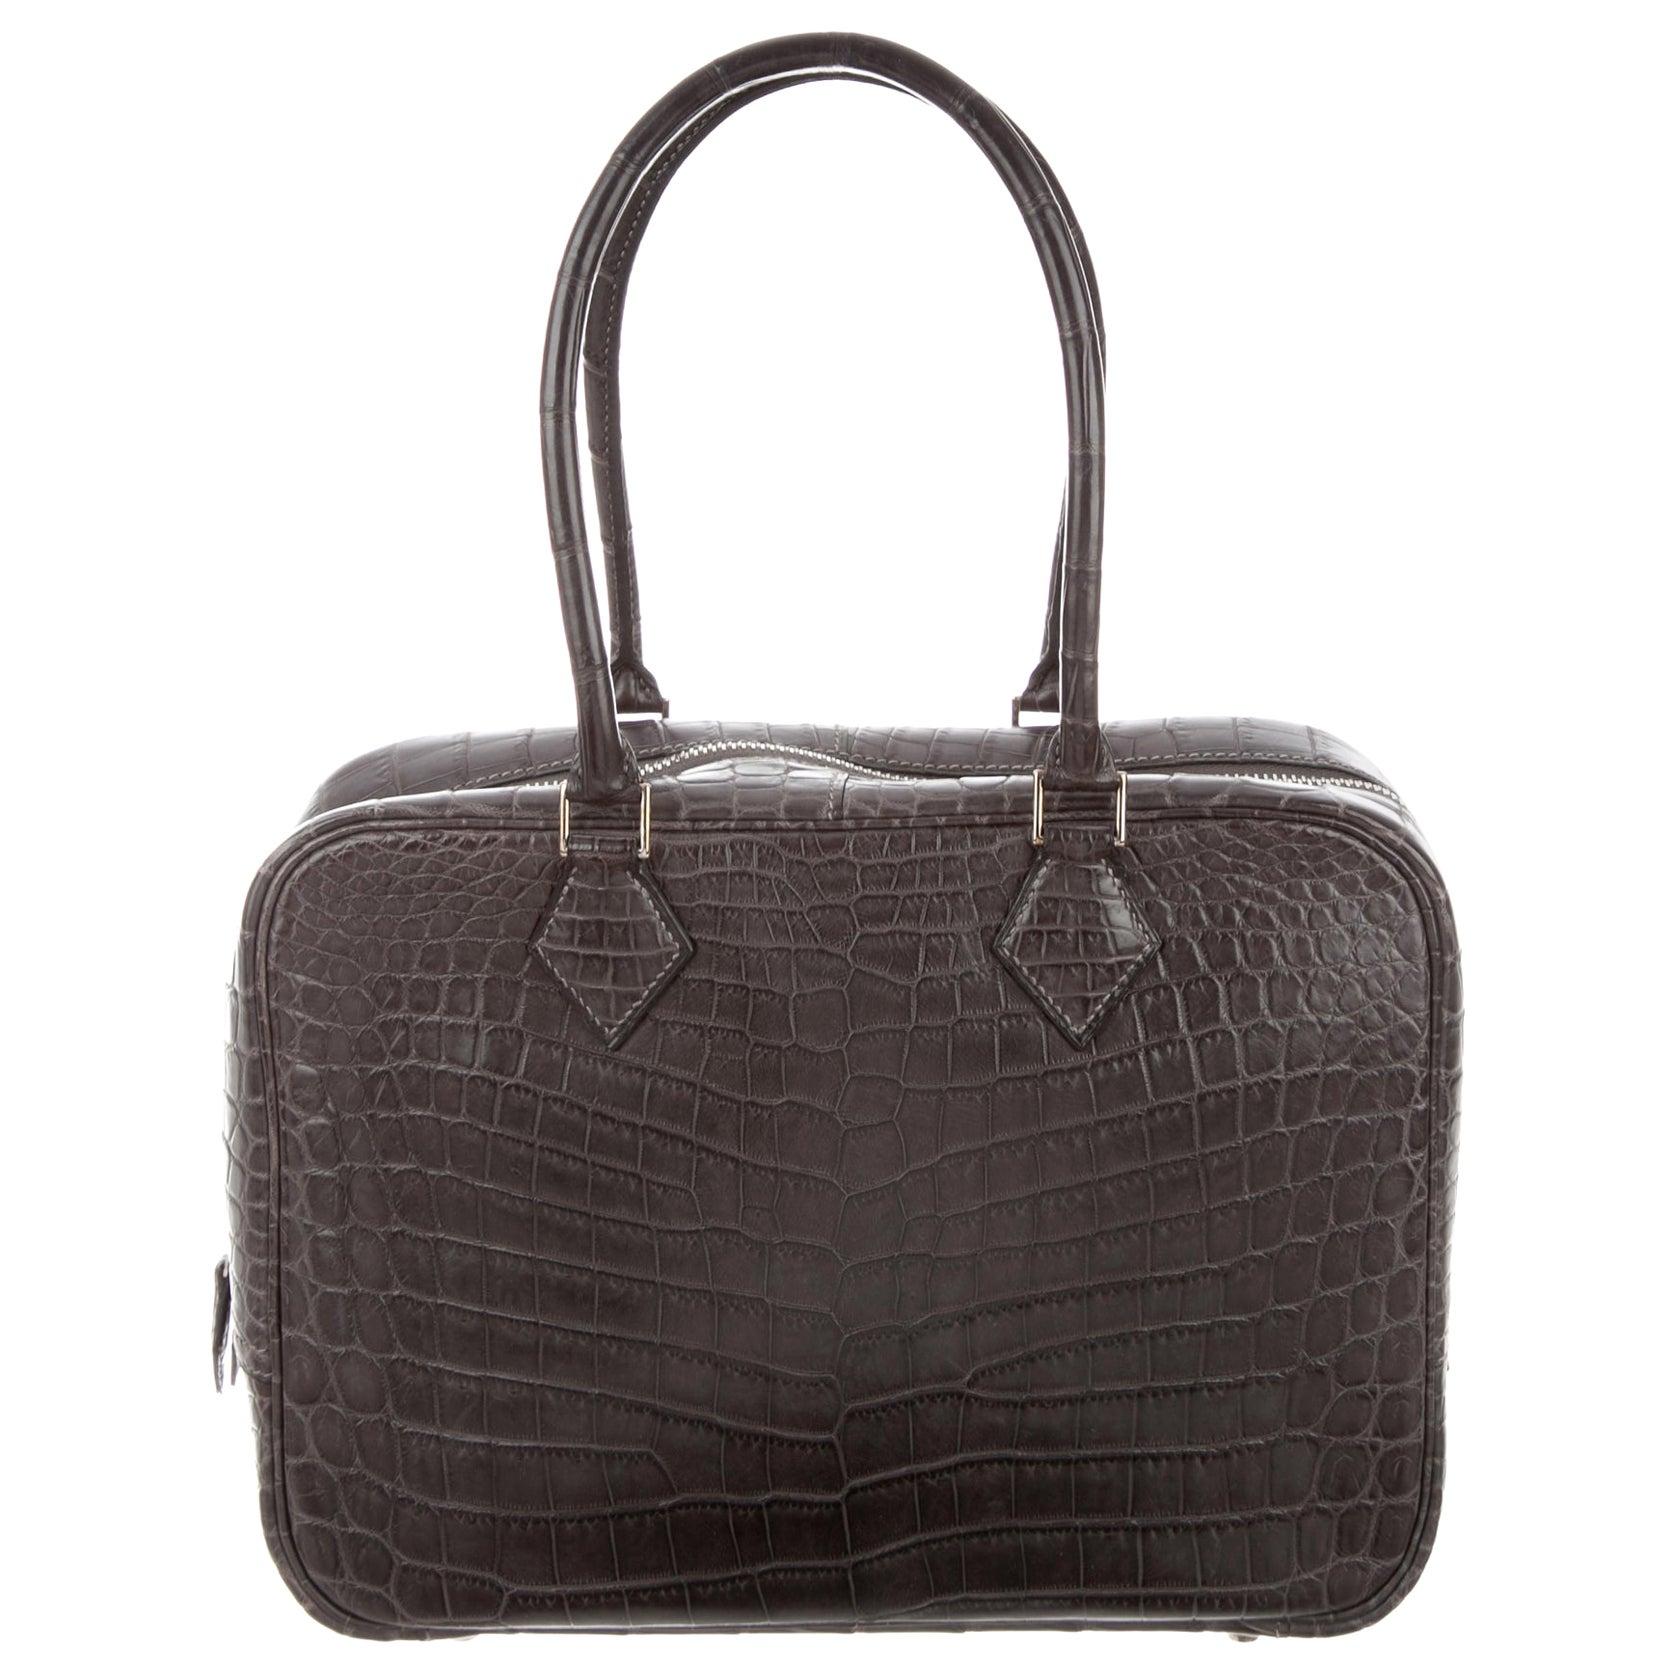 Hermes Crocodile Exotic Leather Palladium Zip Top Handle Satchel Evening Bag